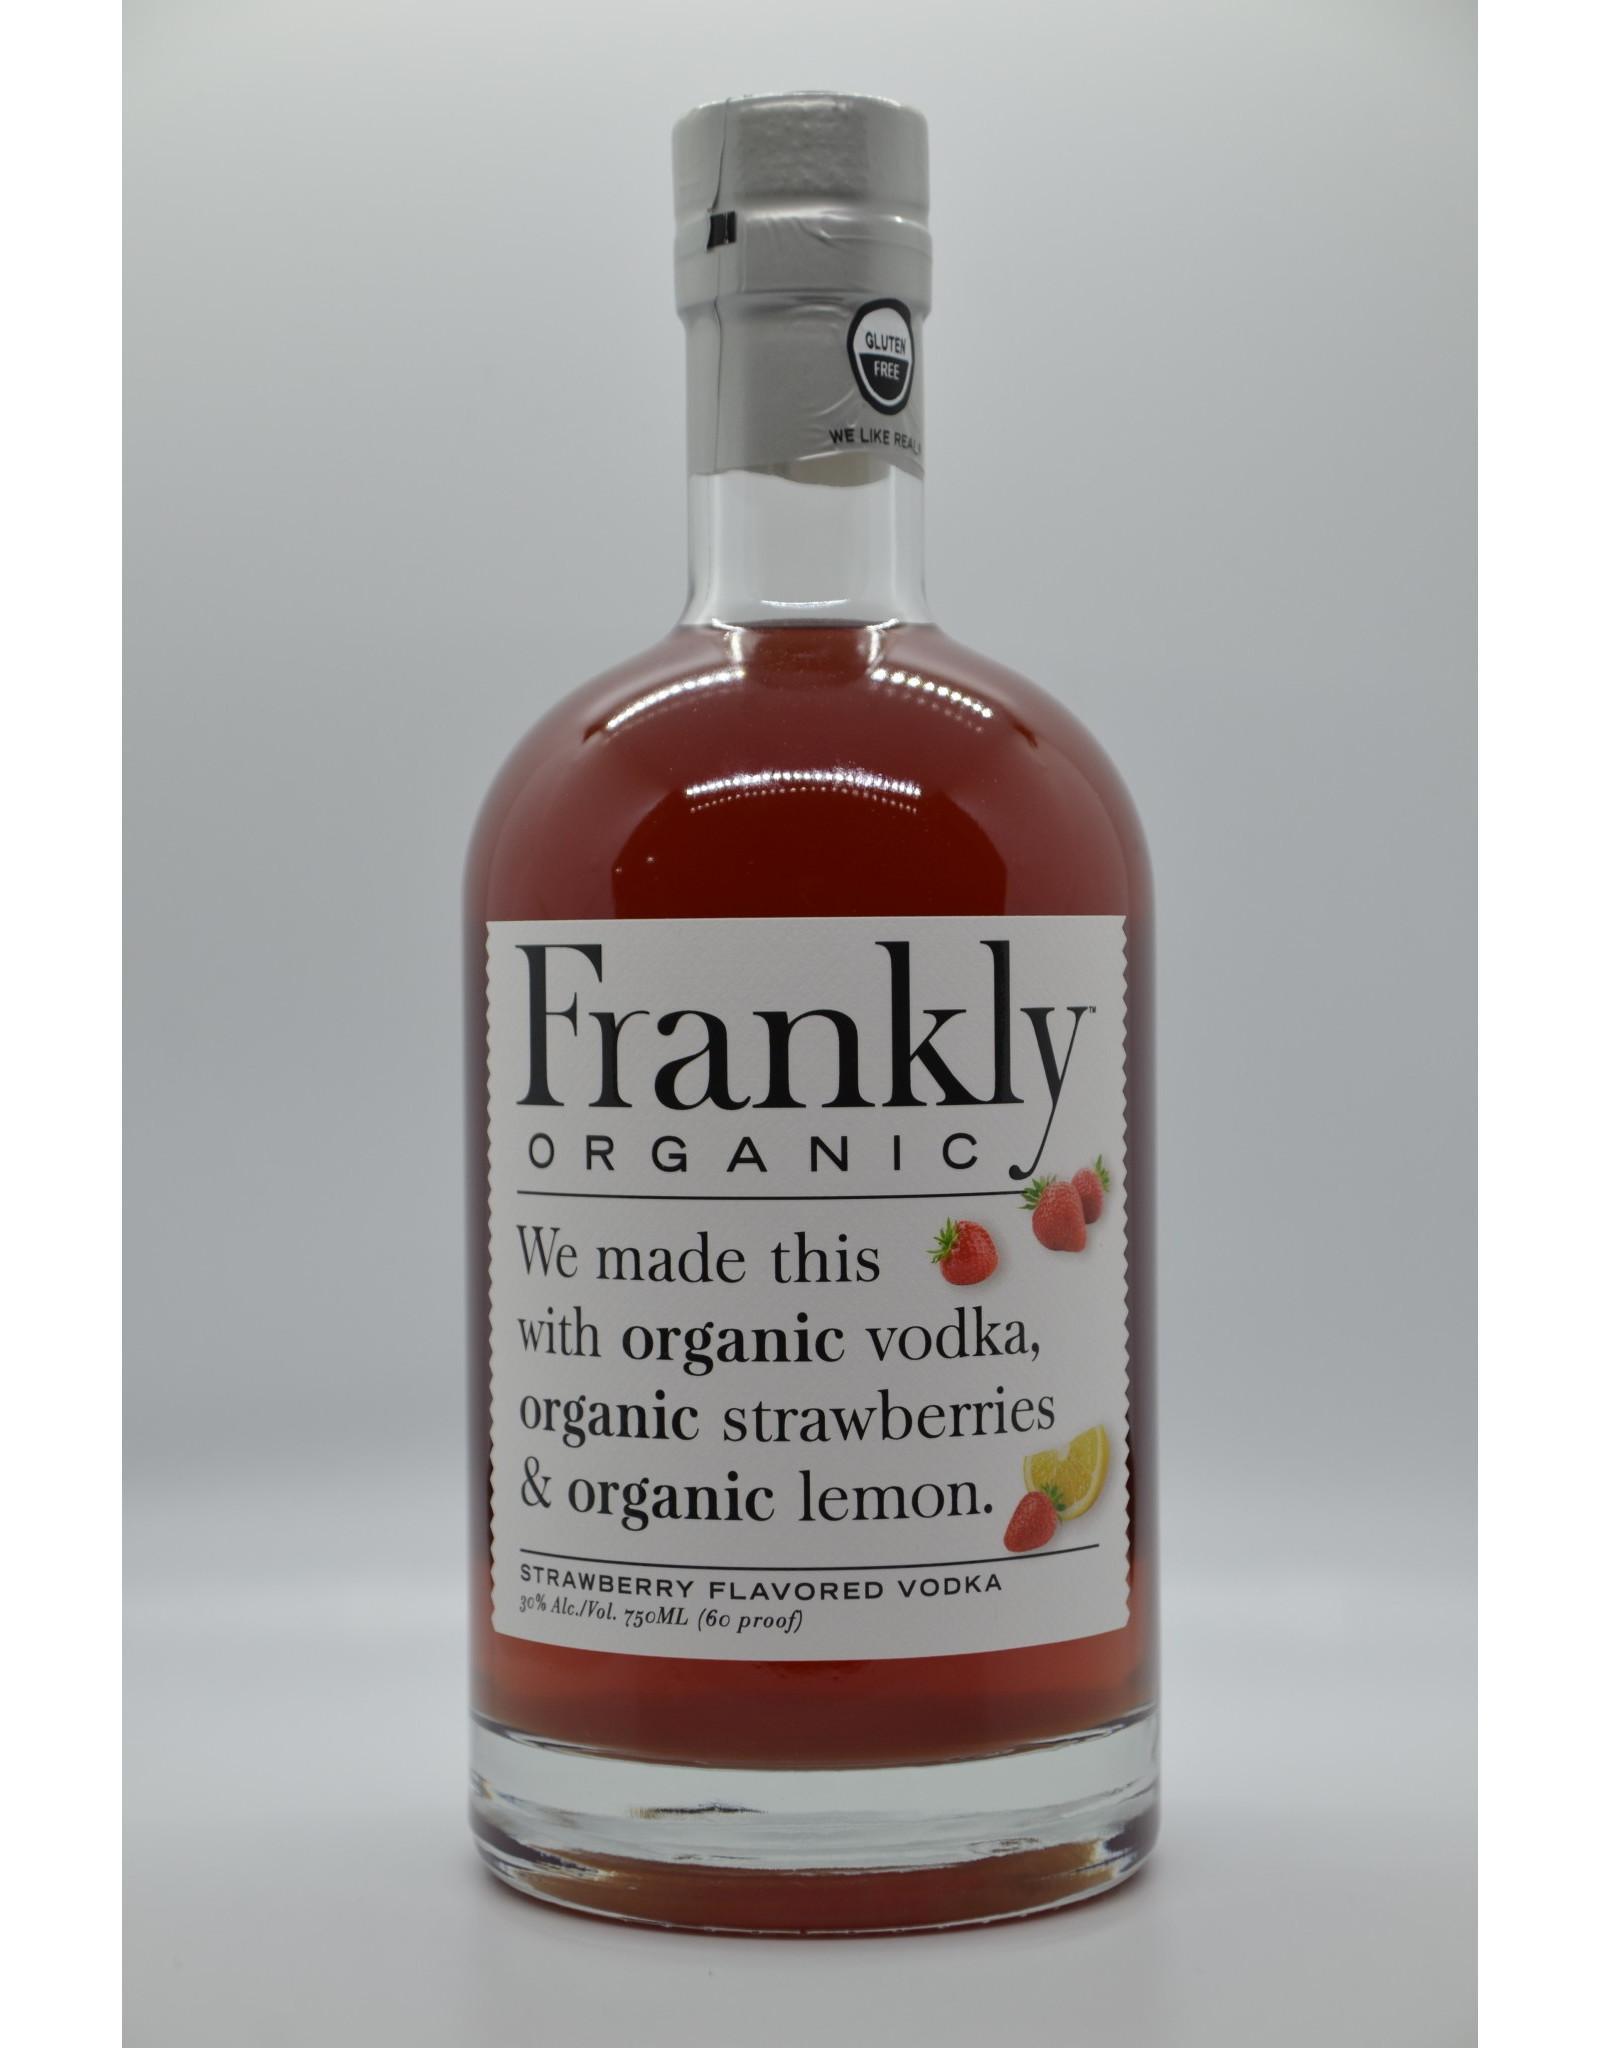 USA Frankly Organic Strawberry Vodka